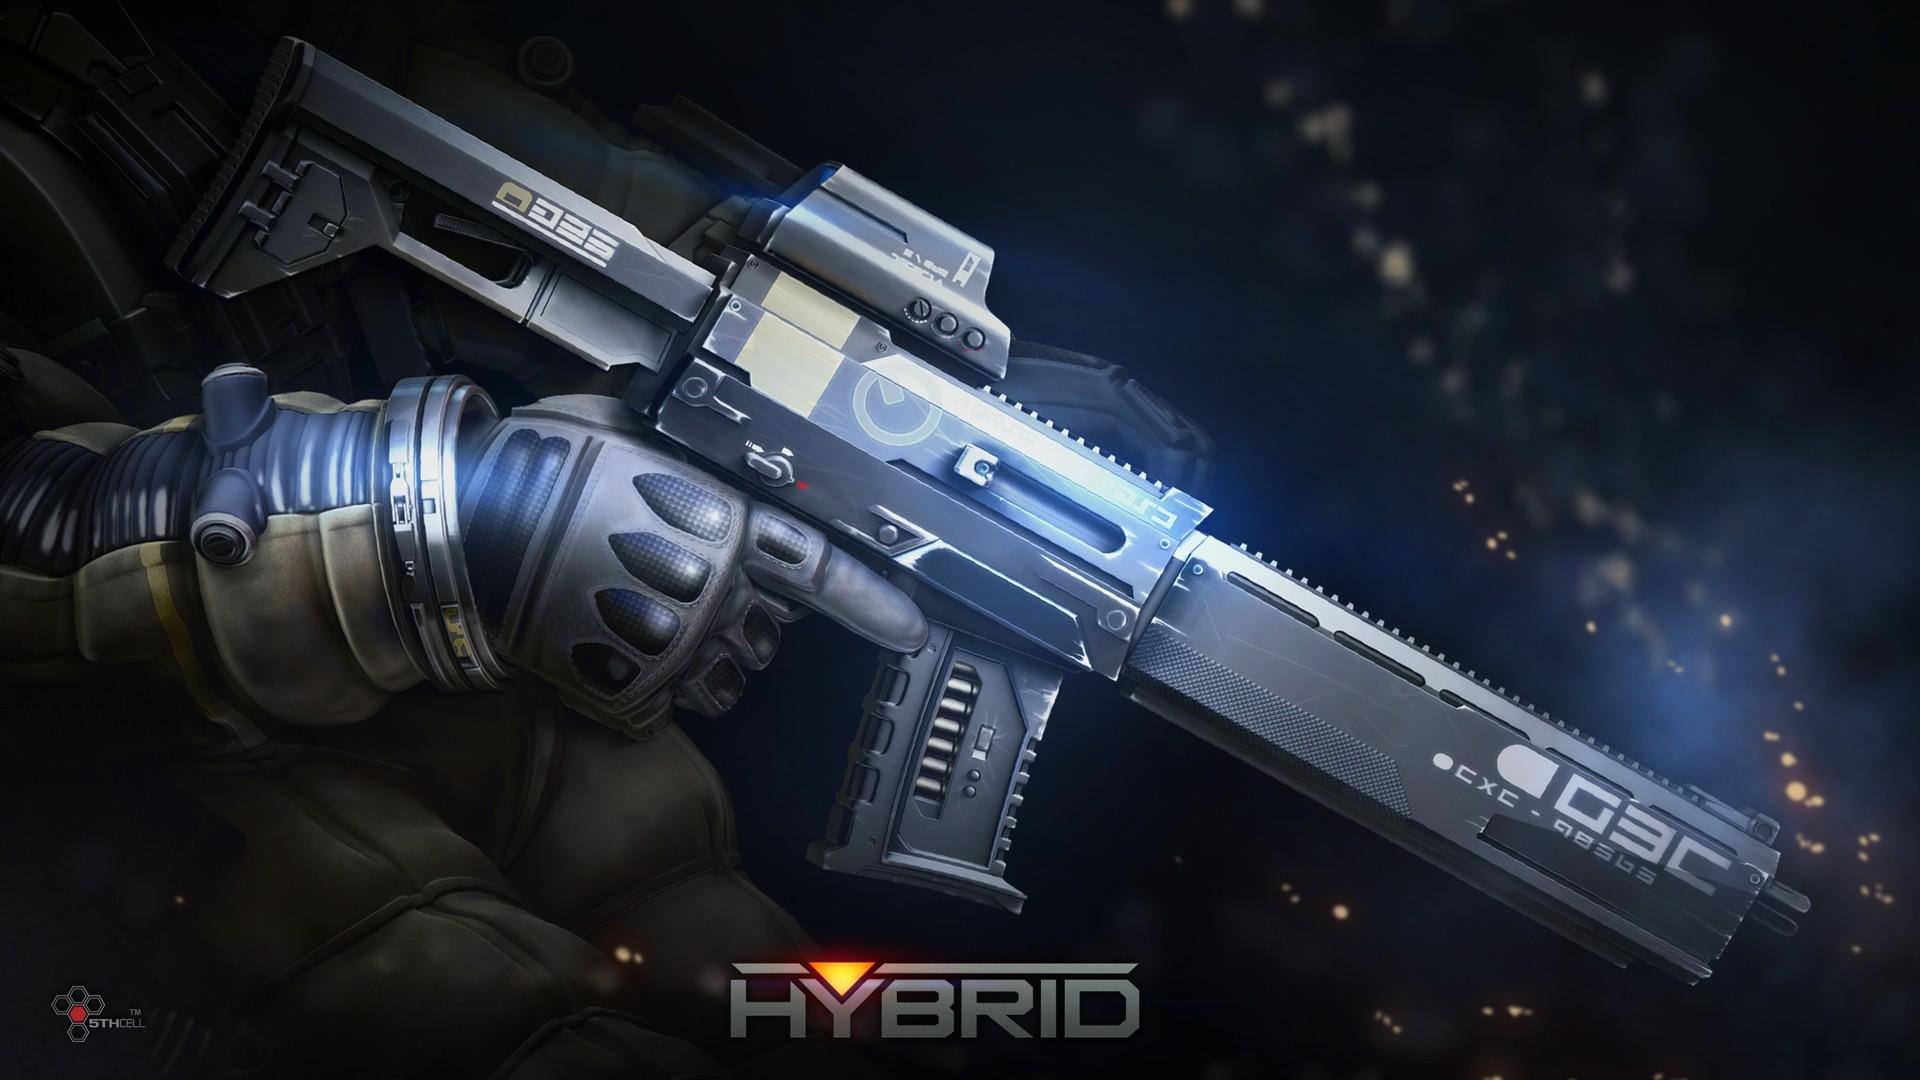 Hybrid Weapon – Hybrid Wallpaper